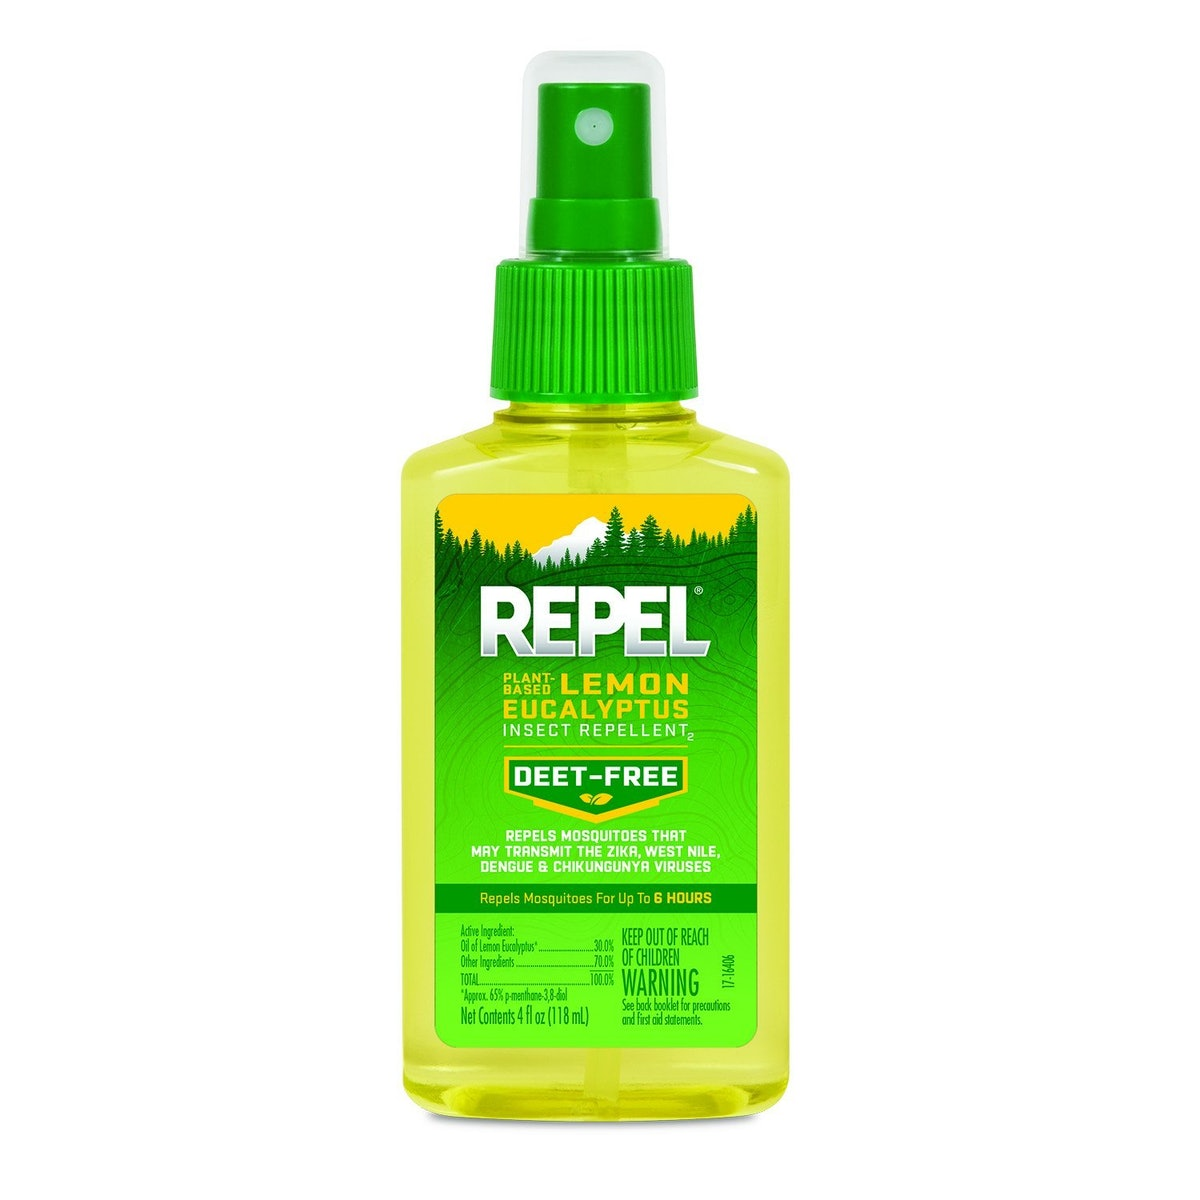 Repel Natural Insect Repellent